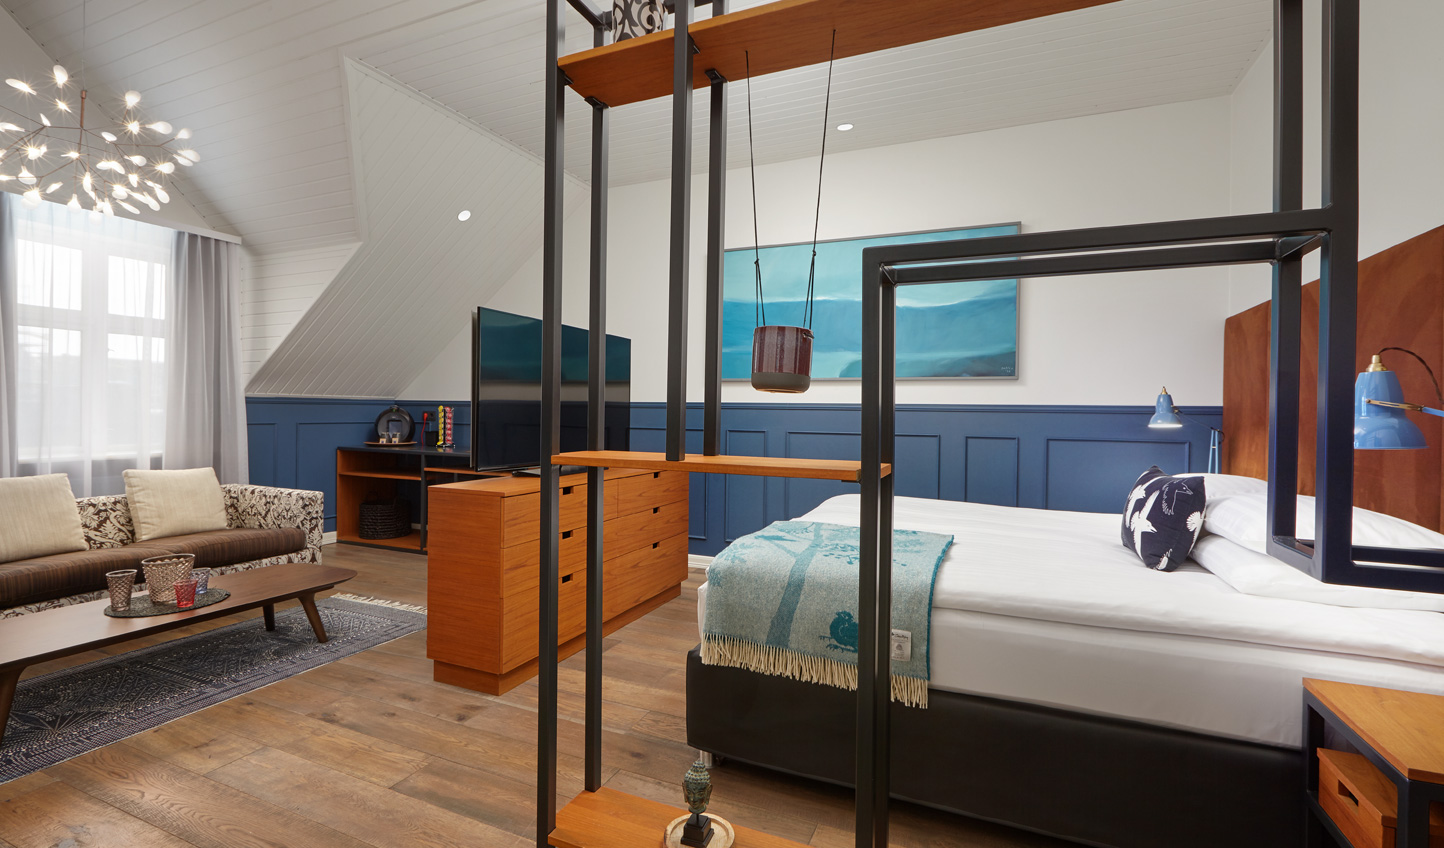 Modern design creates a stylish stay